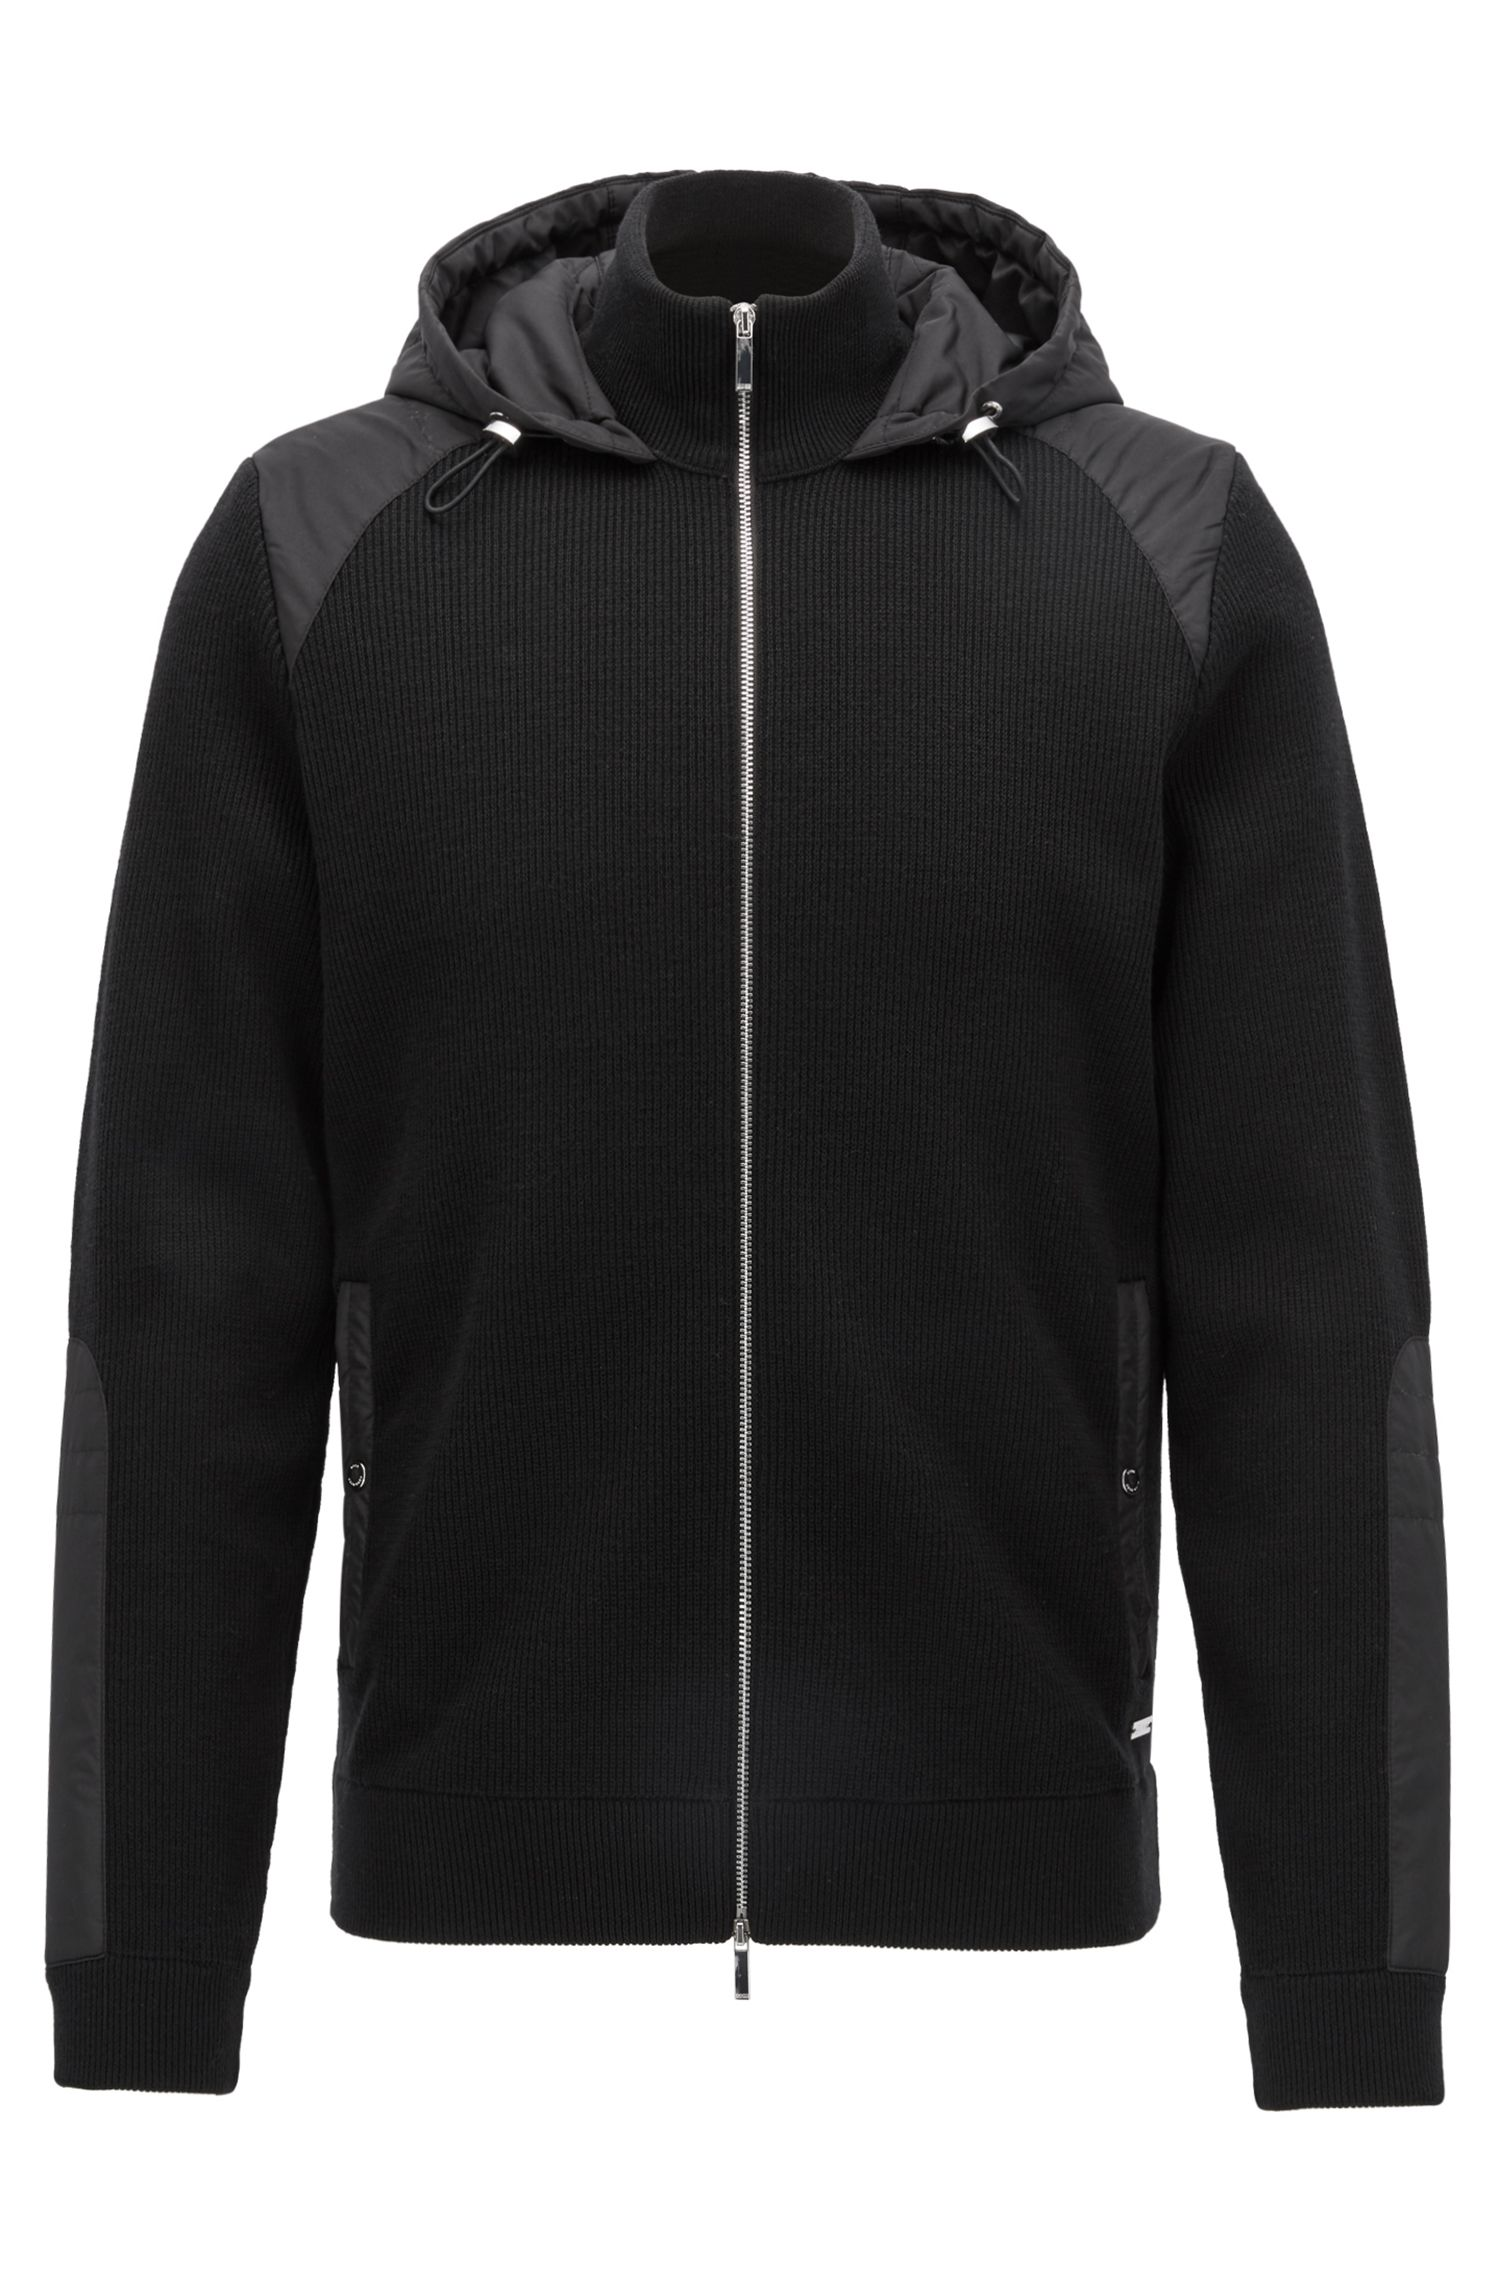 Italian Extra-Fine Merino Wool Full-Zip Jacket, Regular Fit | Daiton